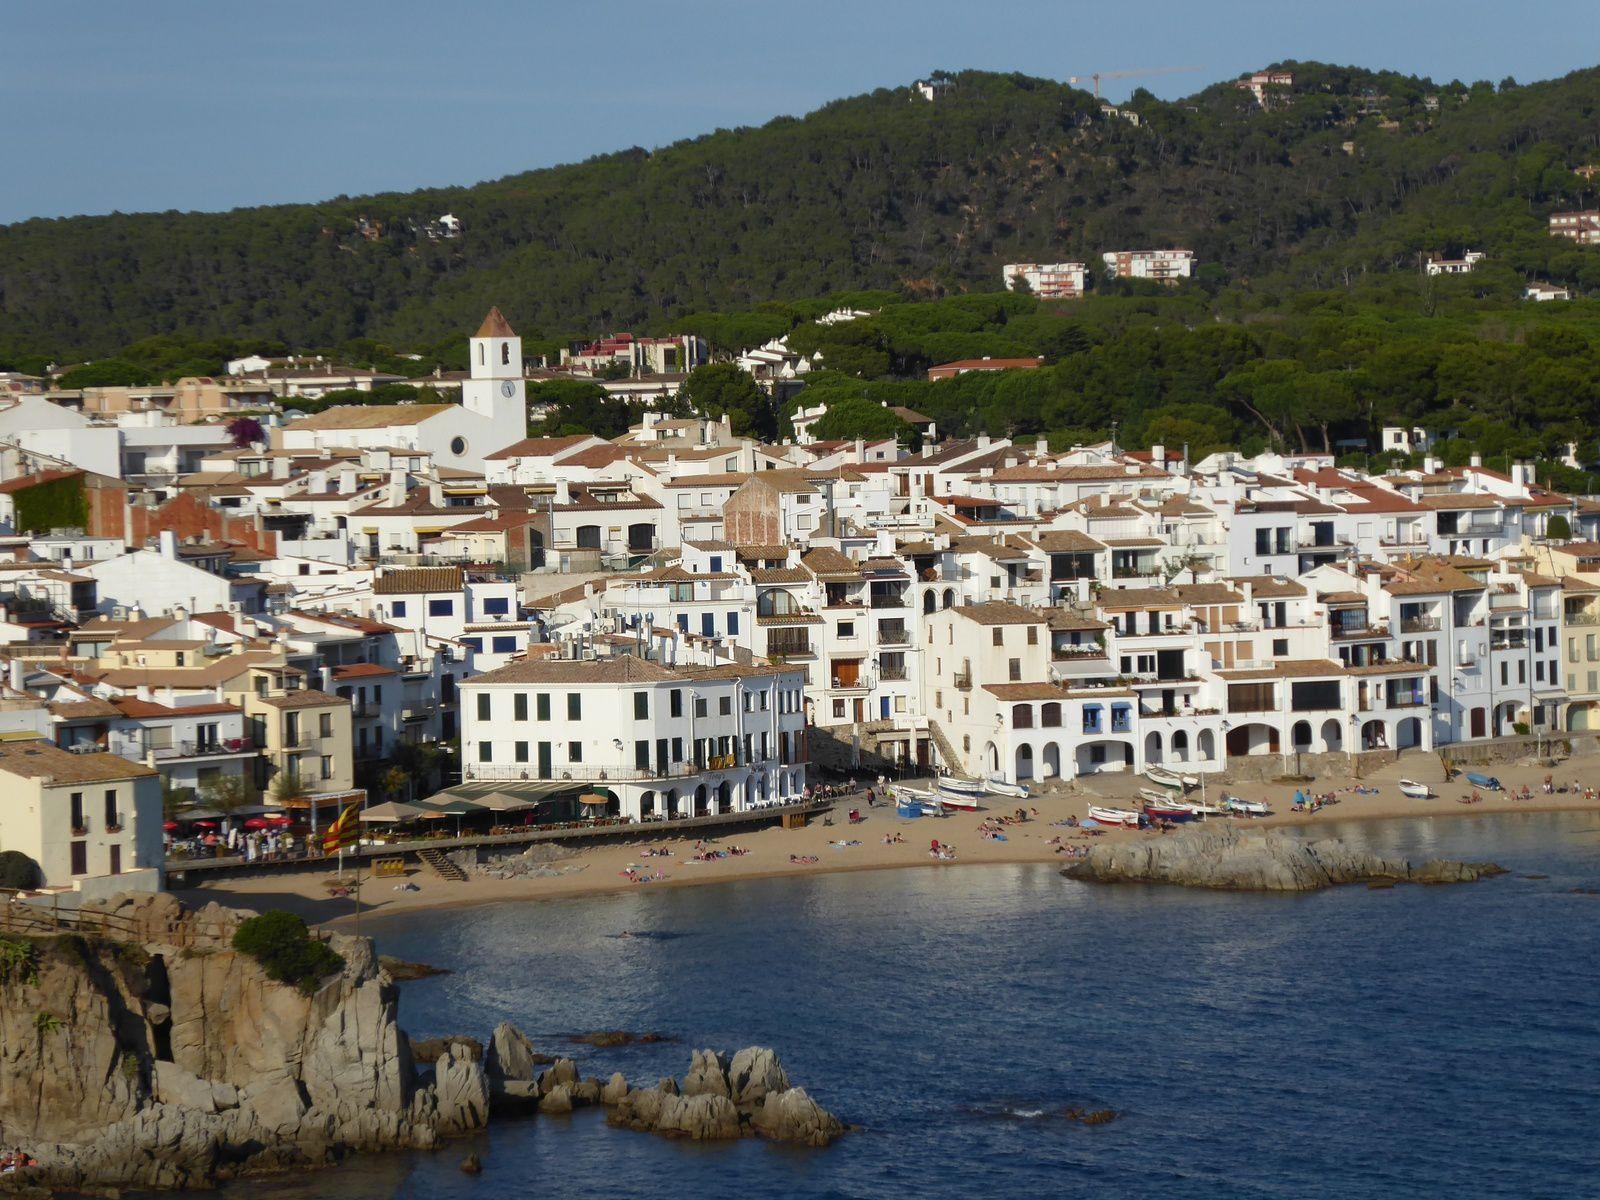 Costa Brava : trois jours de ballade